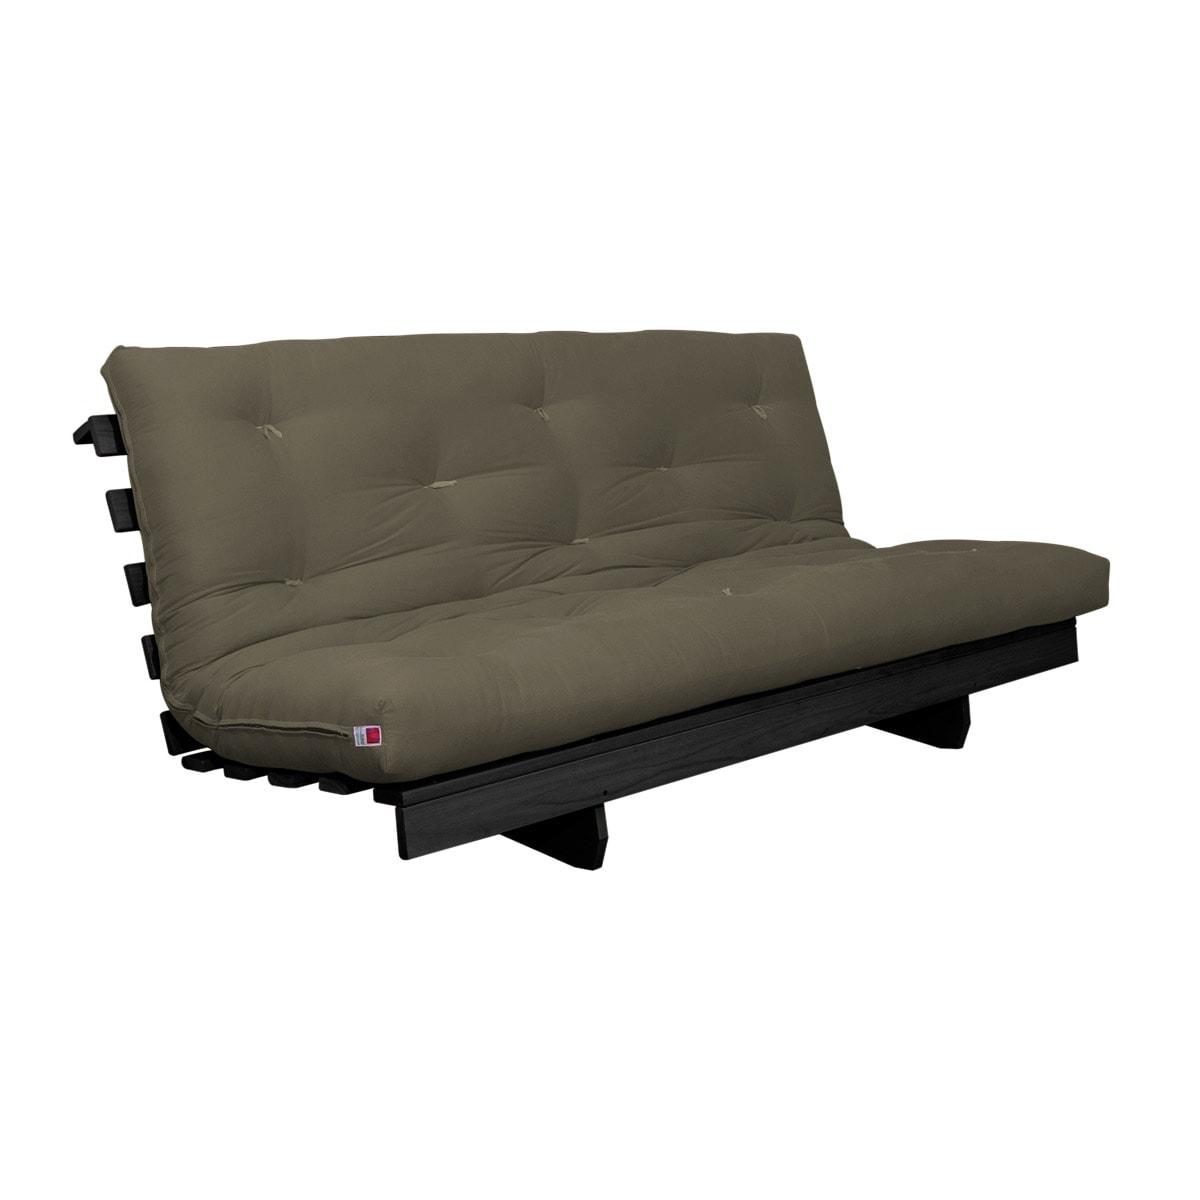 Sofa futon futon company - Sofas cama futon ...